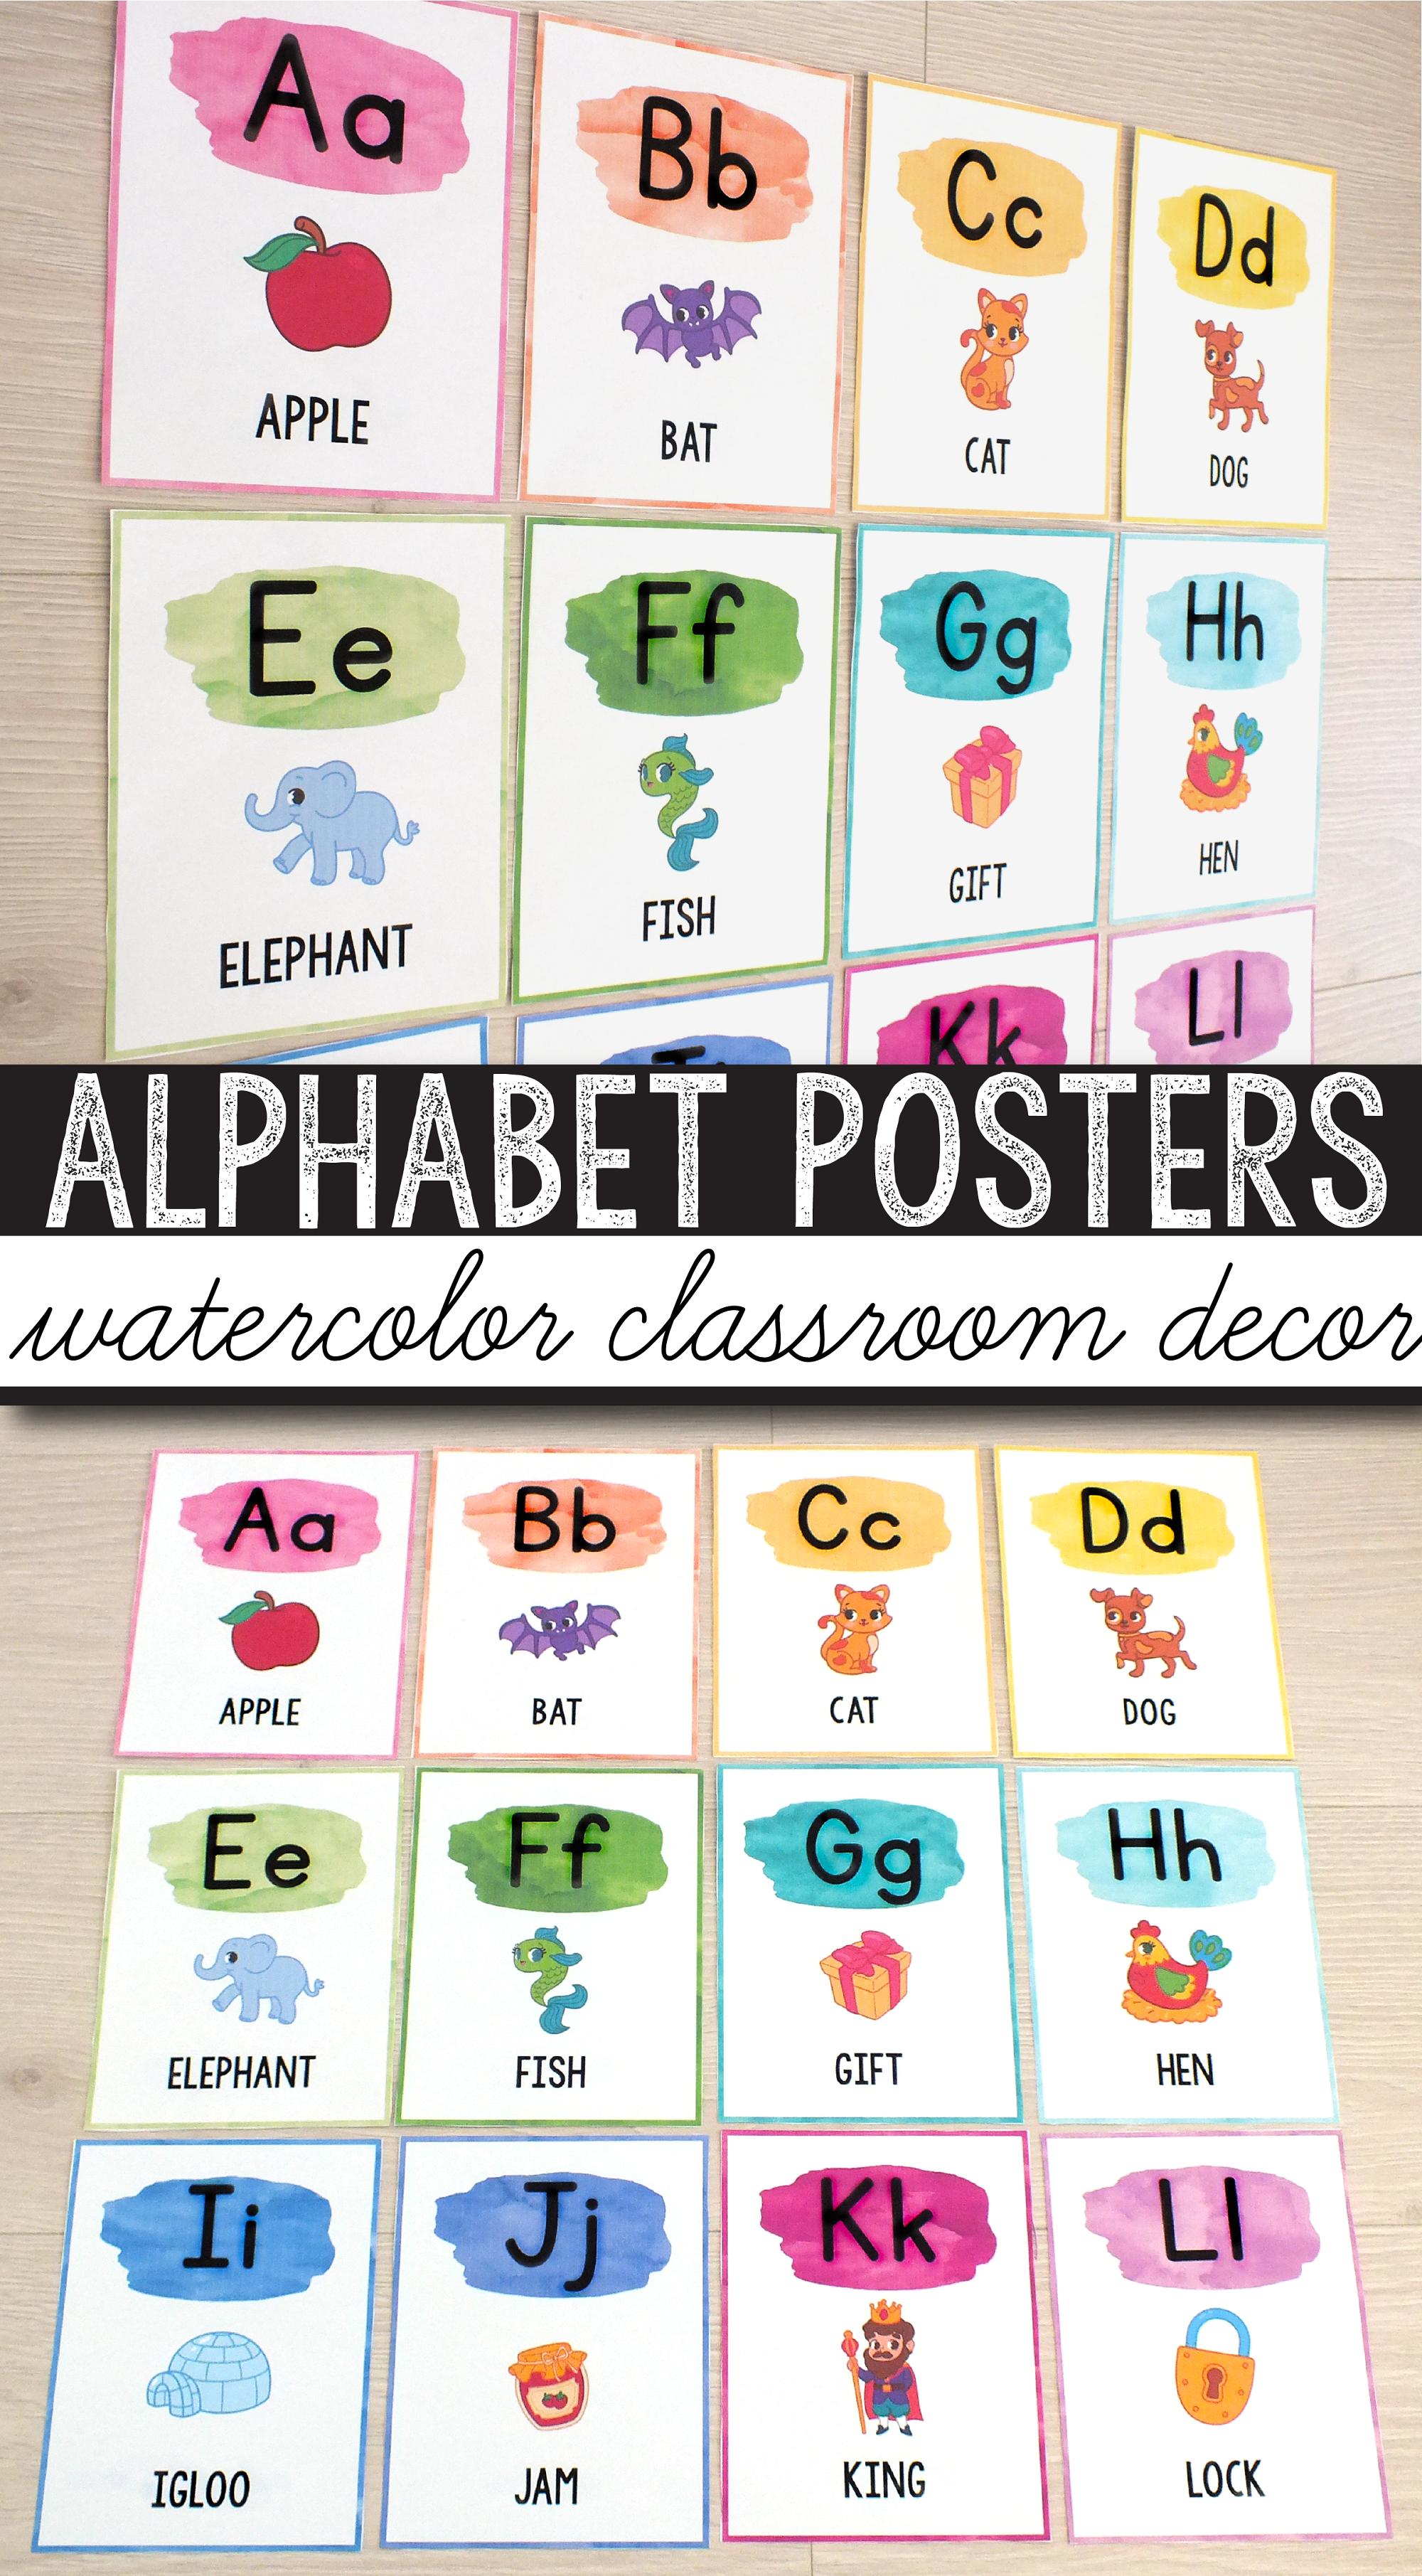 FREE Alphabet Posters - Print & Cursive - Watercolor Classroom Decor